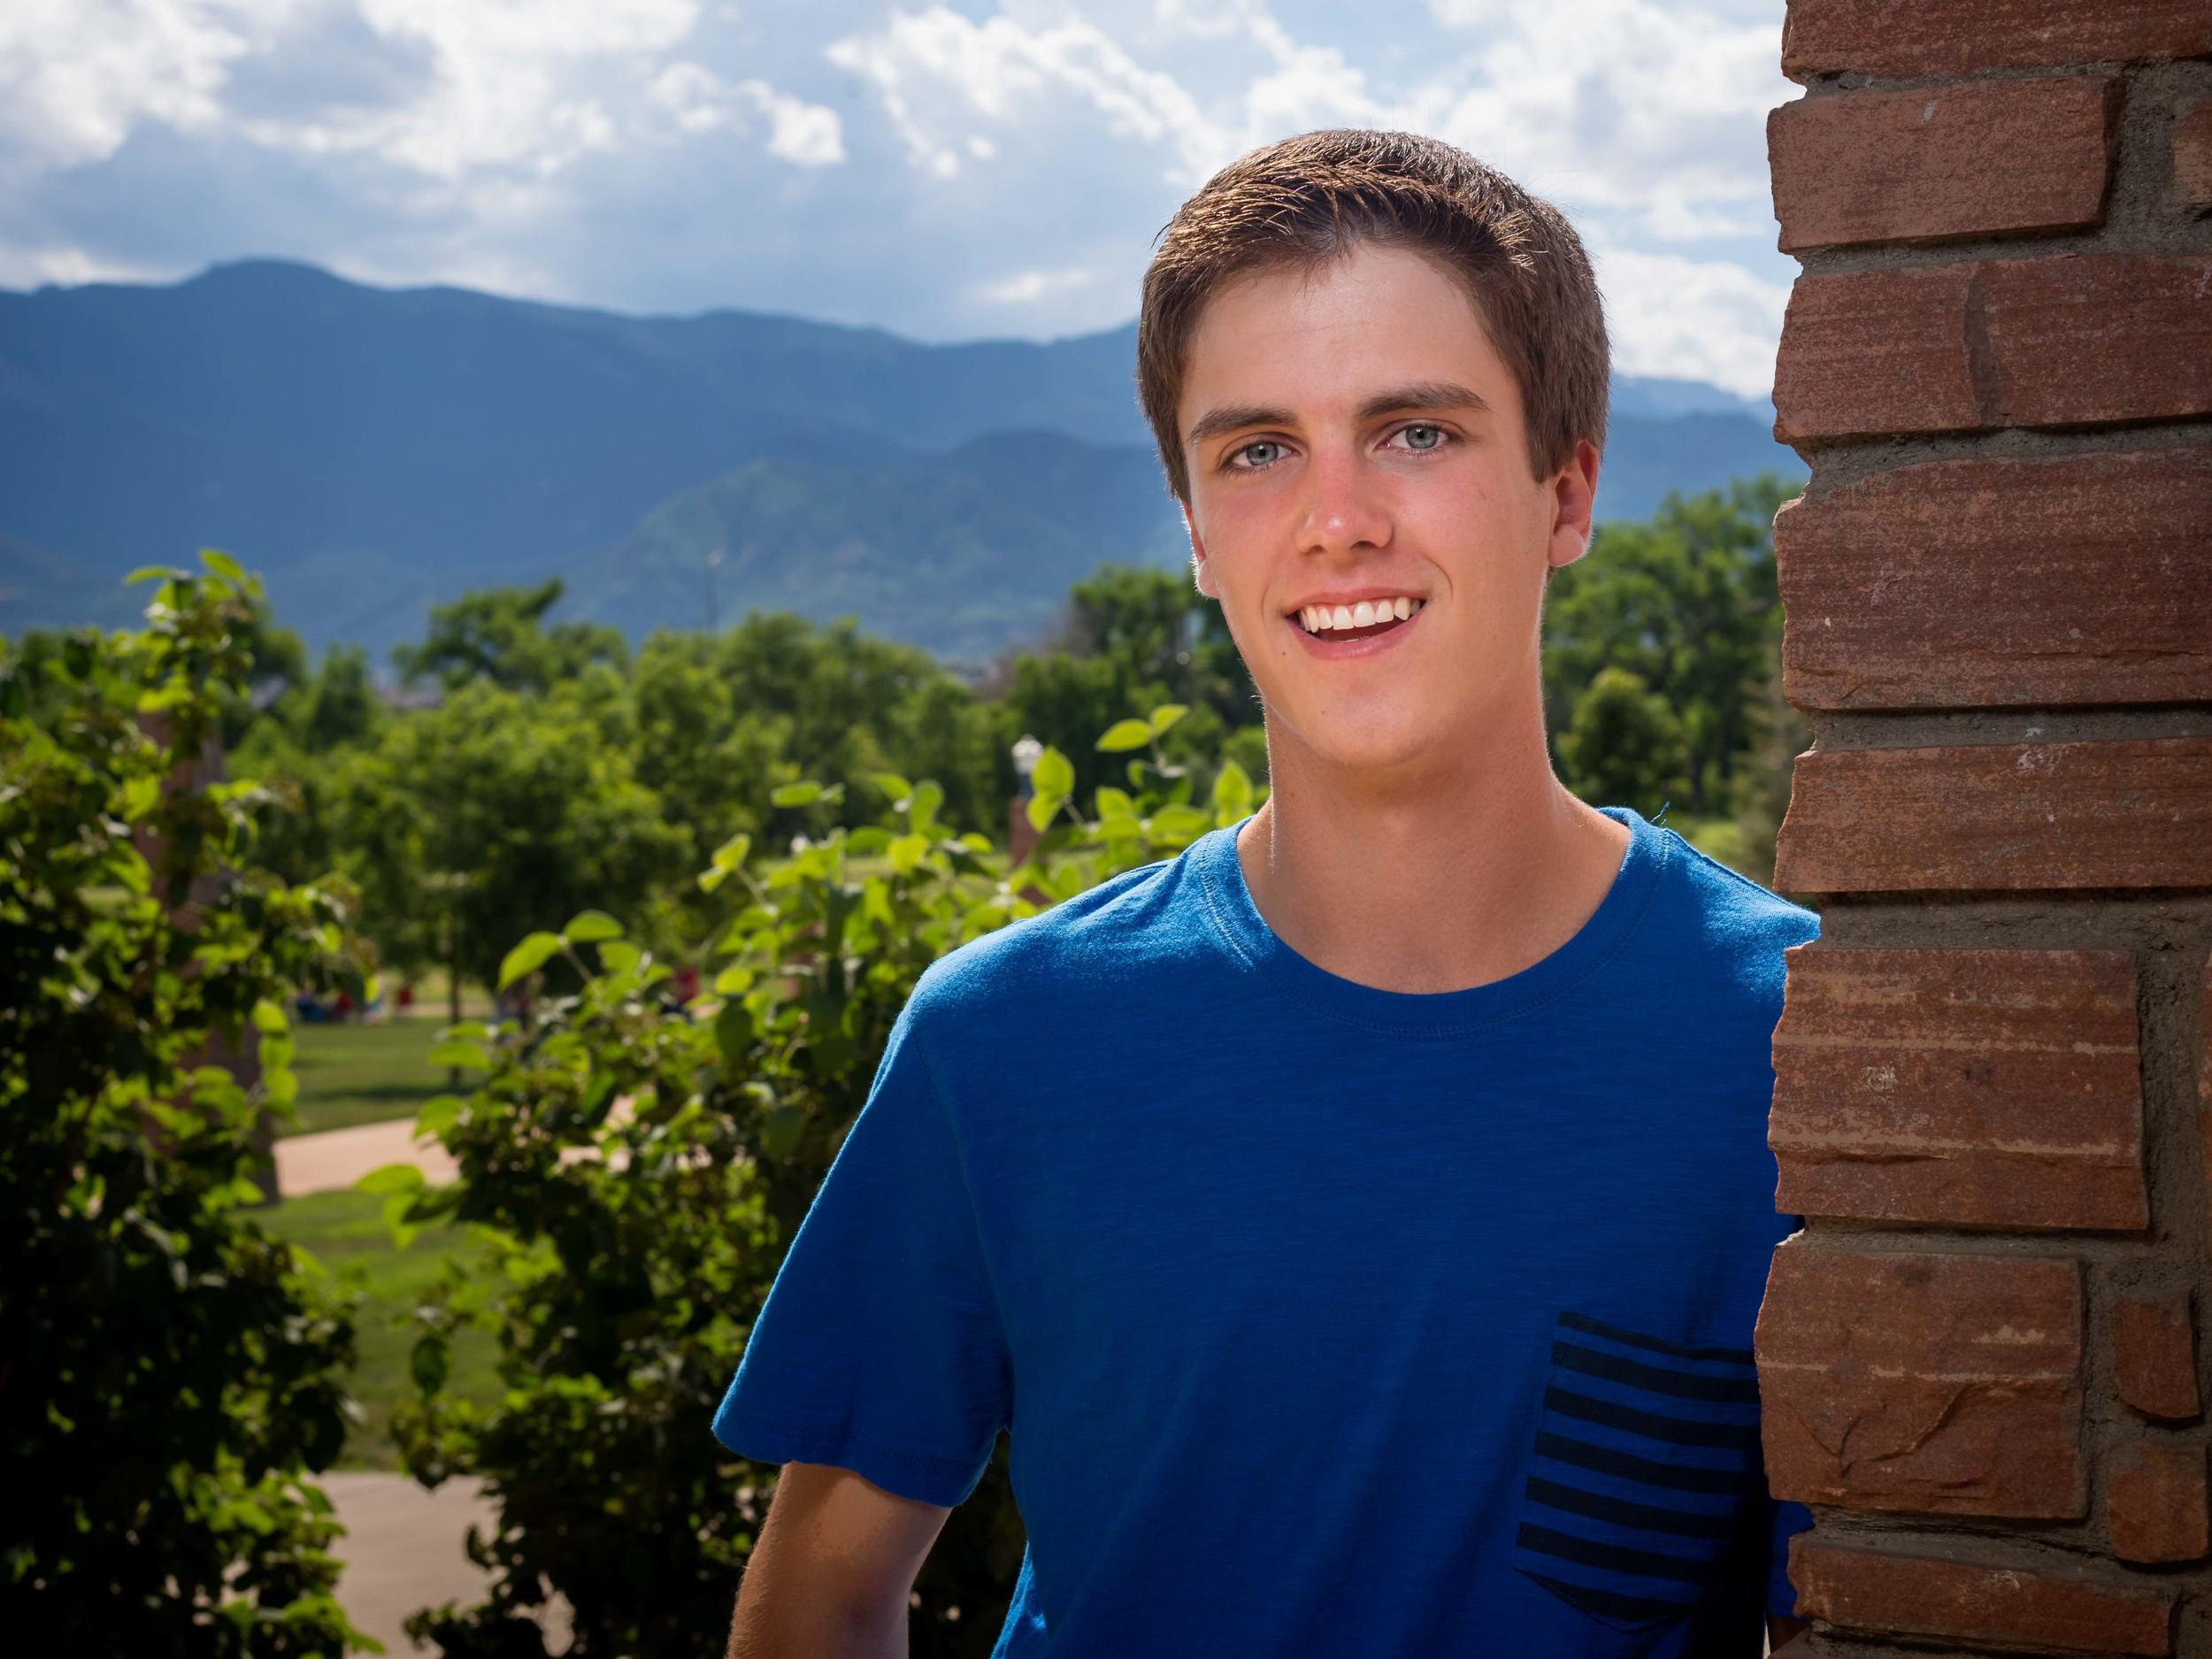 Brett P. from Coronado High School.  Senior photo session, 2015.